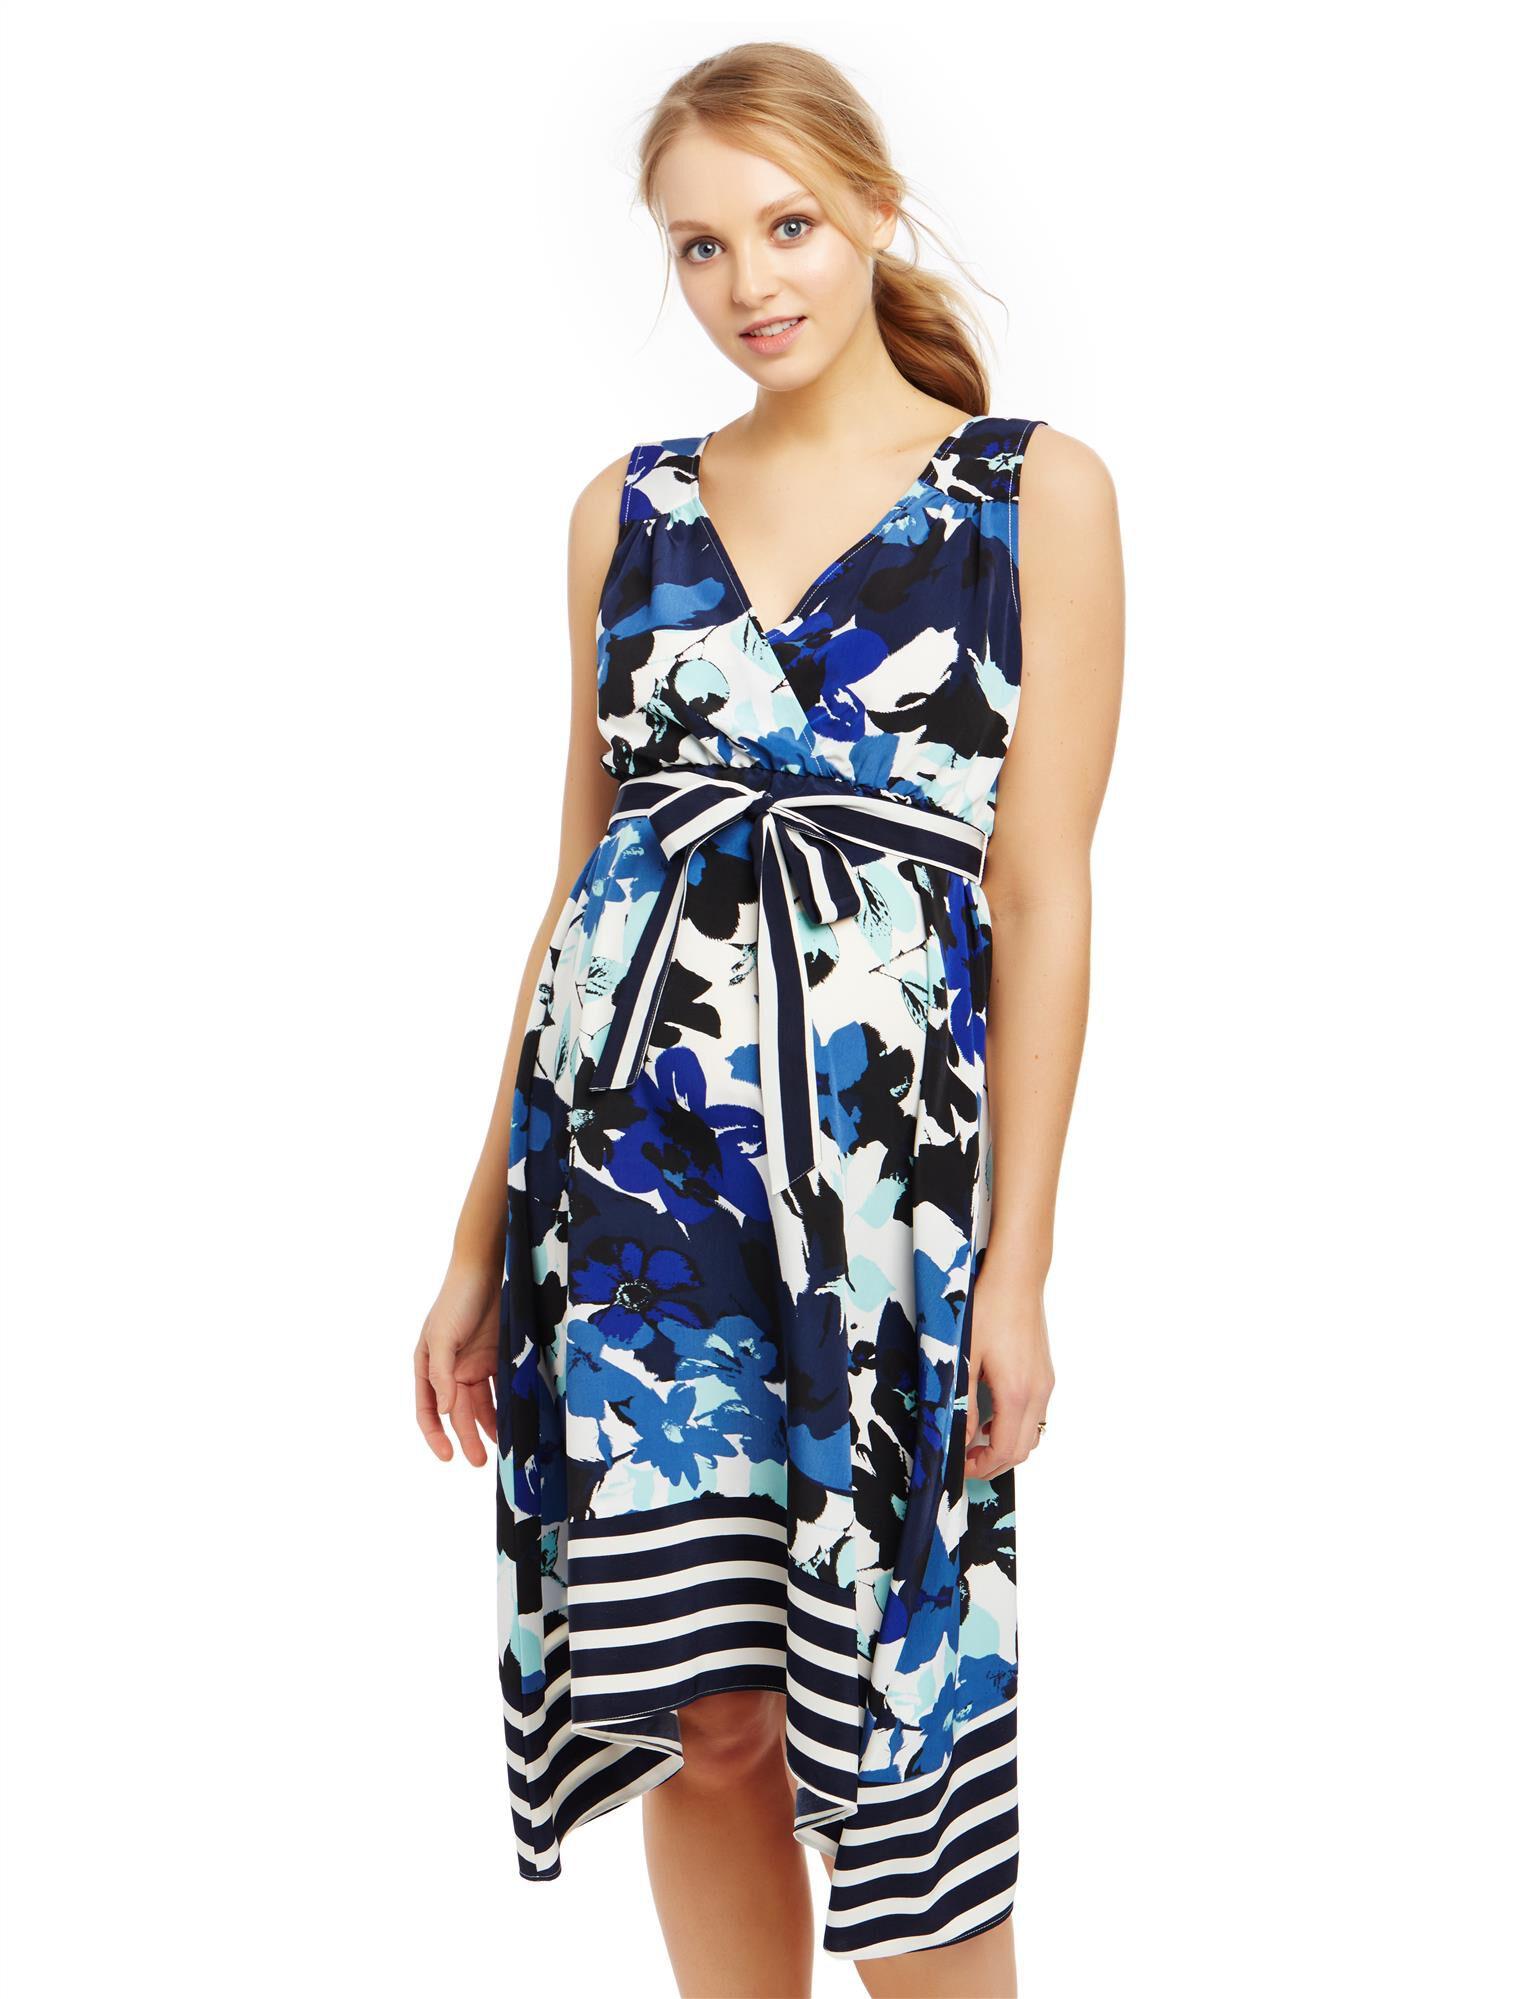 Belted Hanky Hem Maternity Dress